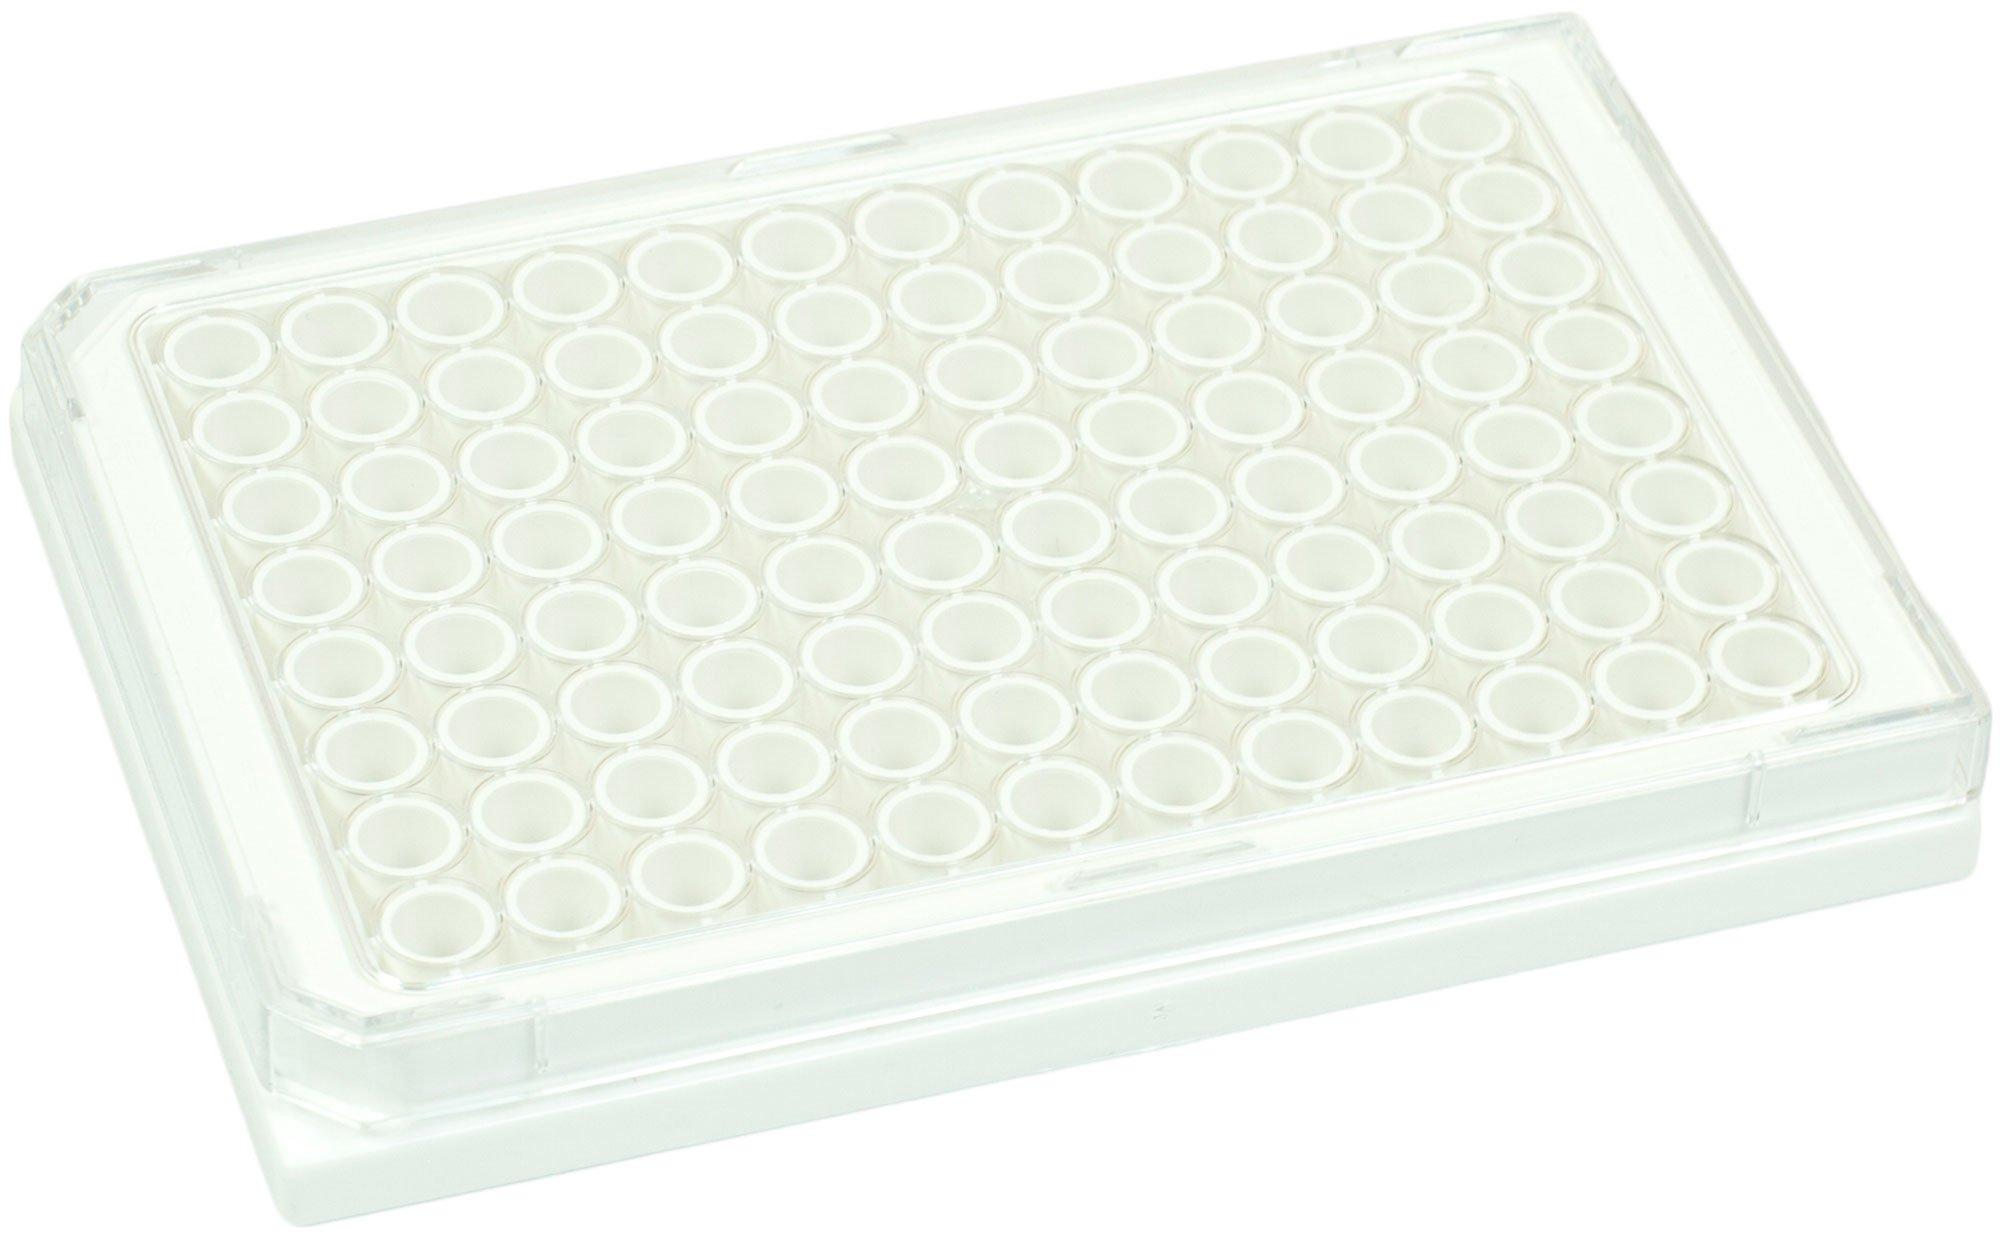 BRANDplates cellGrade Plus Treated Sterile Surface 96-Well Plate - White, Transparent F-Bottom